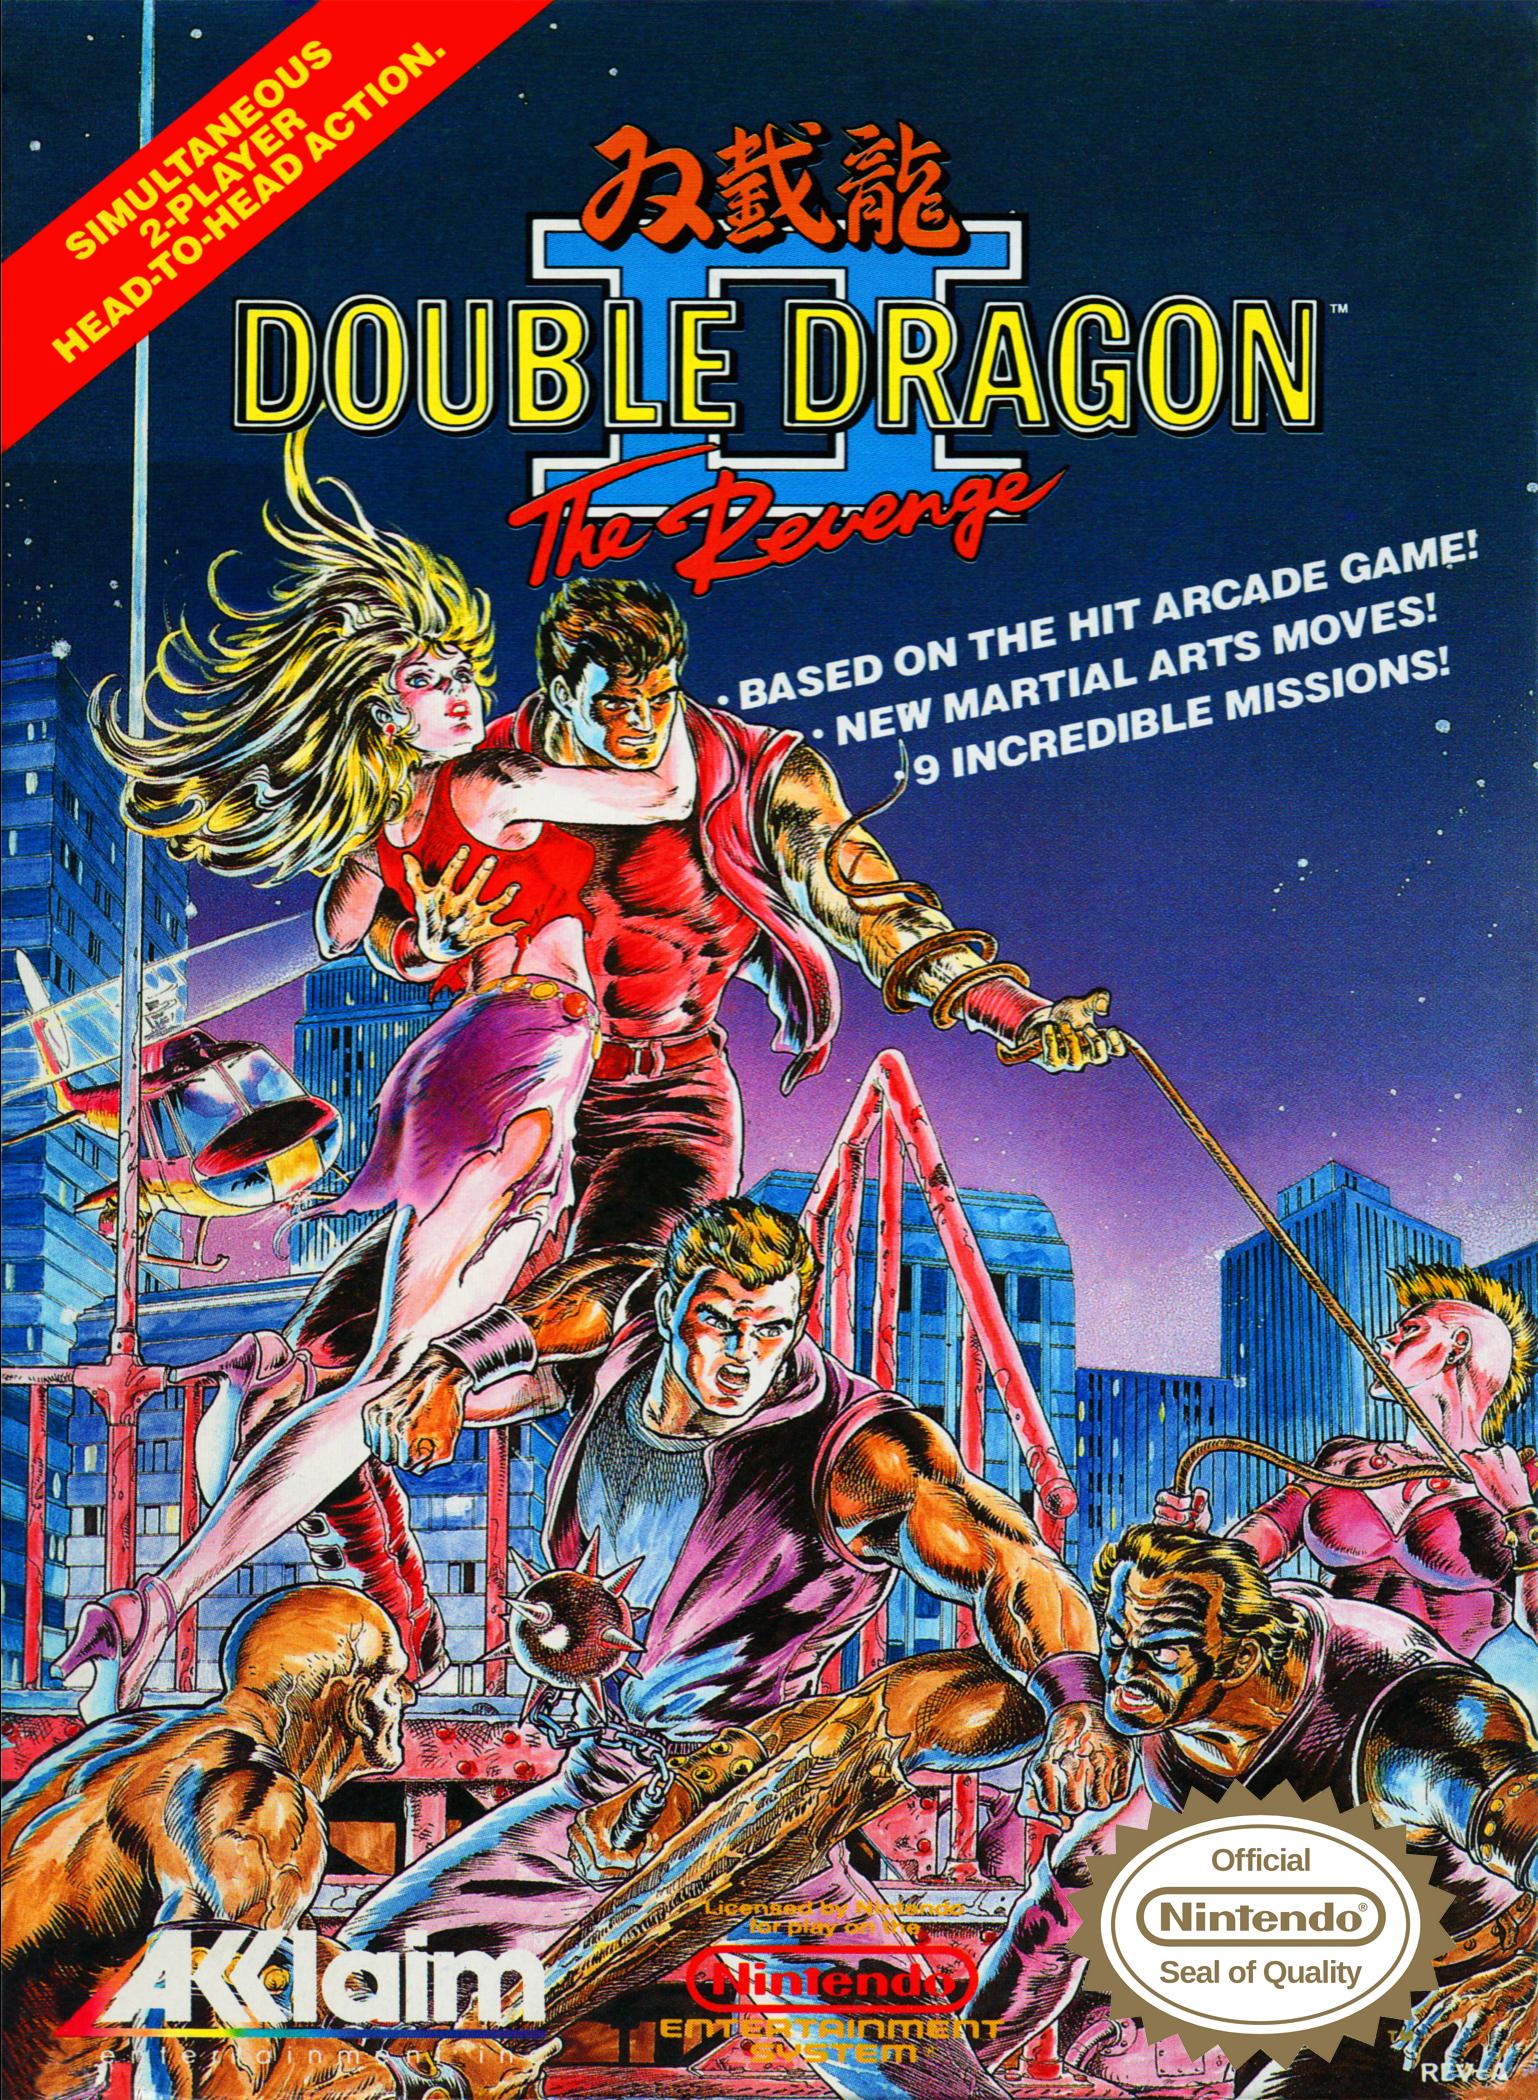 Double Dragon Ii The Revenge Nes 1990 Retro Video Games Nes Games Nintendo Nes Games